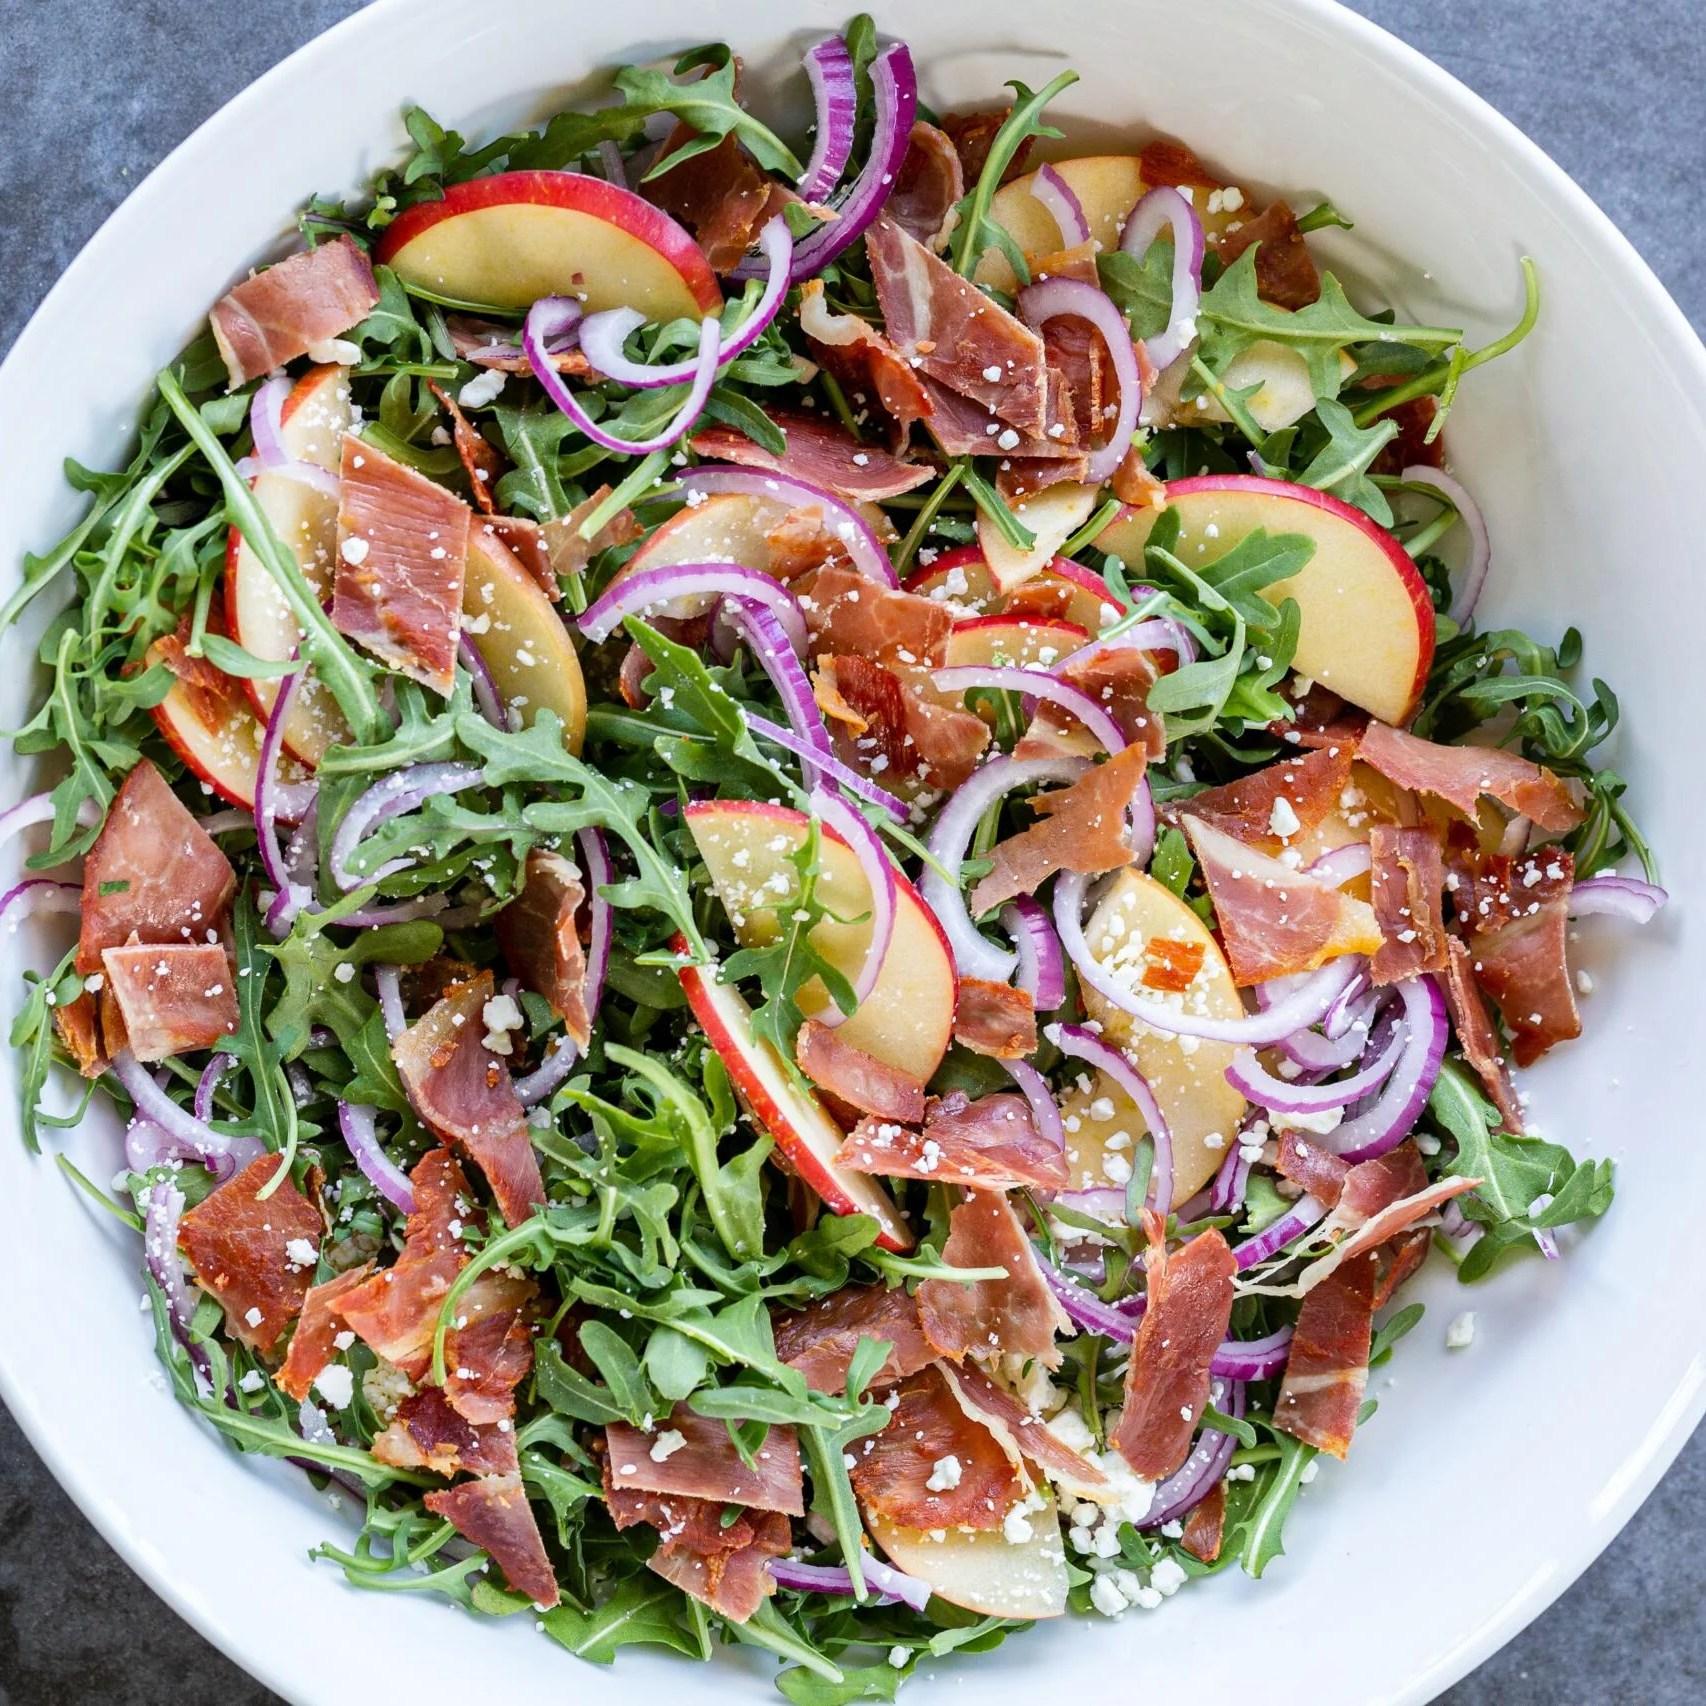 Arugula salad with prosciutto pieces on top